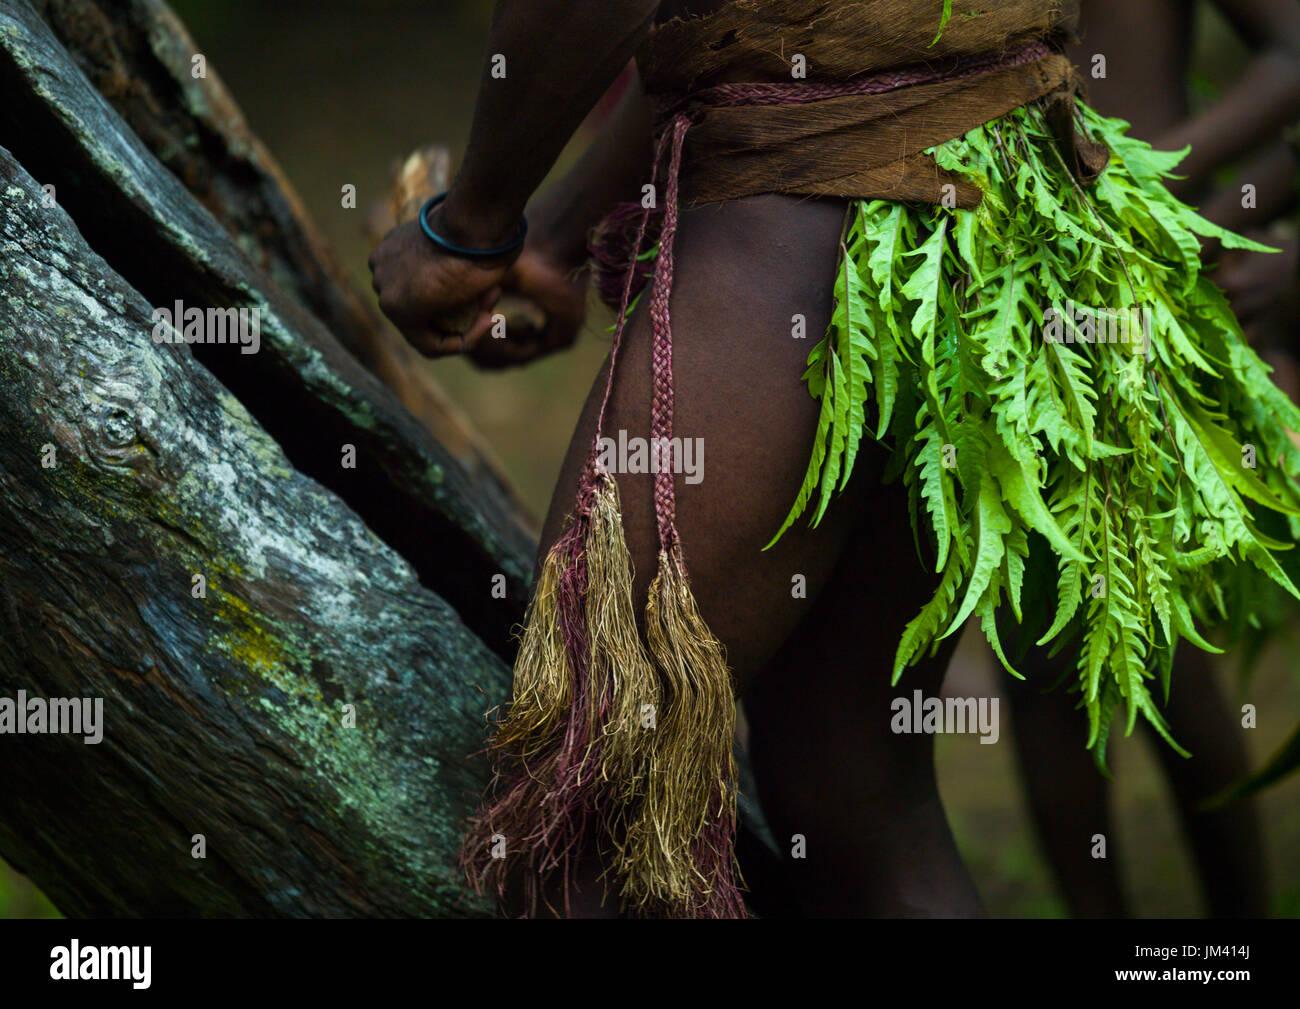 Big Nambas tribesman beating a slit drum during a ceremony, Malampa Province, Malekula Island, Vanuatu - Stock Image